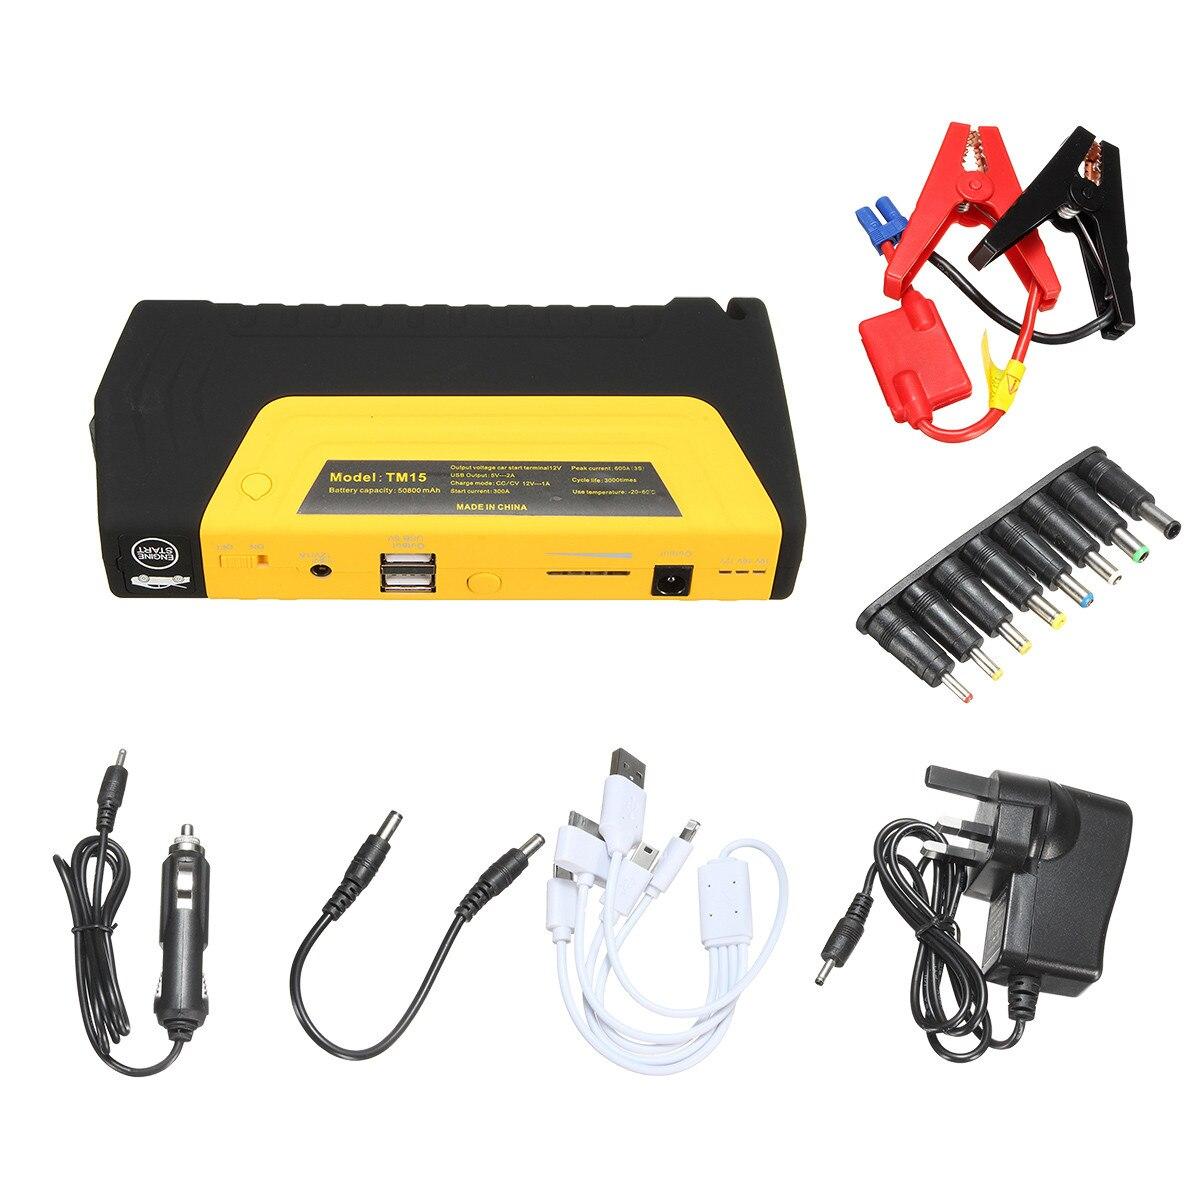 50800 mAh LED Dual USB Car Jump Starter Booster portátil banco de energía cargador de reserva fuente de alimentación-in Fuente de alimentación ininterrumpida from Mejoras para el hogar on AliExpress - 11.11_Double 11_Singles' Day 1